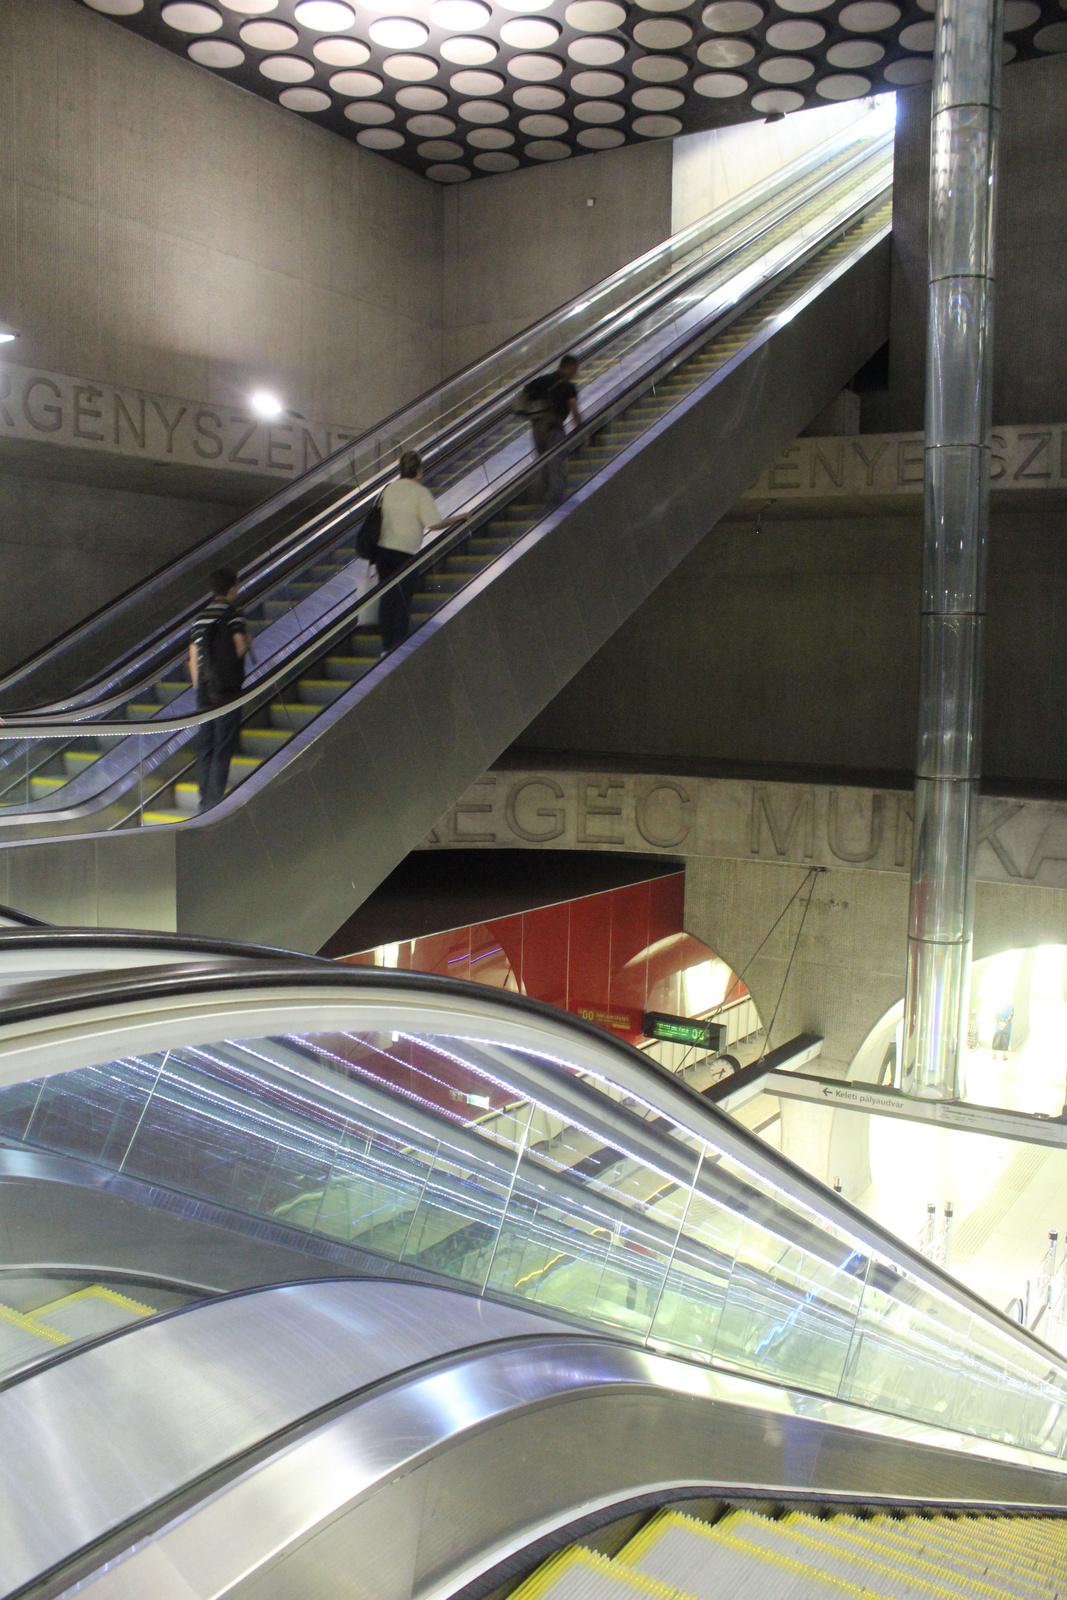 fovarosi.blog.hu: Metro4-RakocziTer-20150605-07 - indafoto.hu